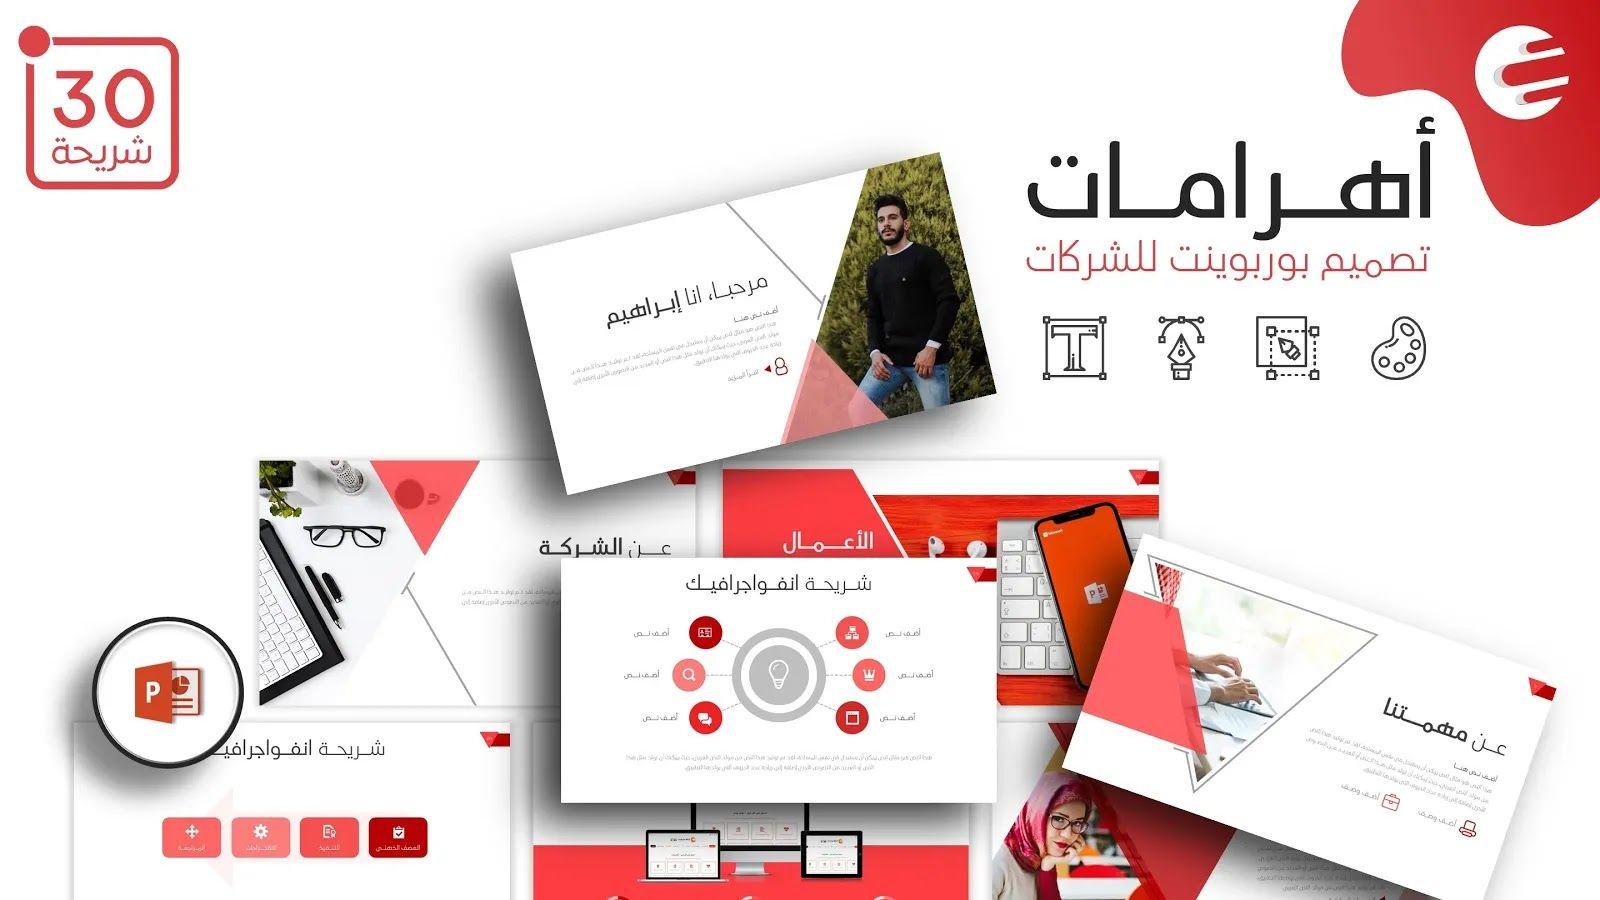 أهرامات قالب بوربوينت عربي متعدد الاستخدام جاهز للتعديل عليه Employees Card Templates Concrete House